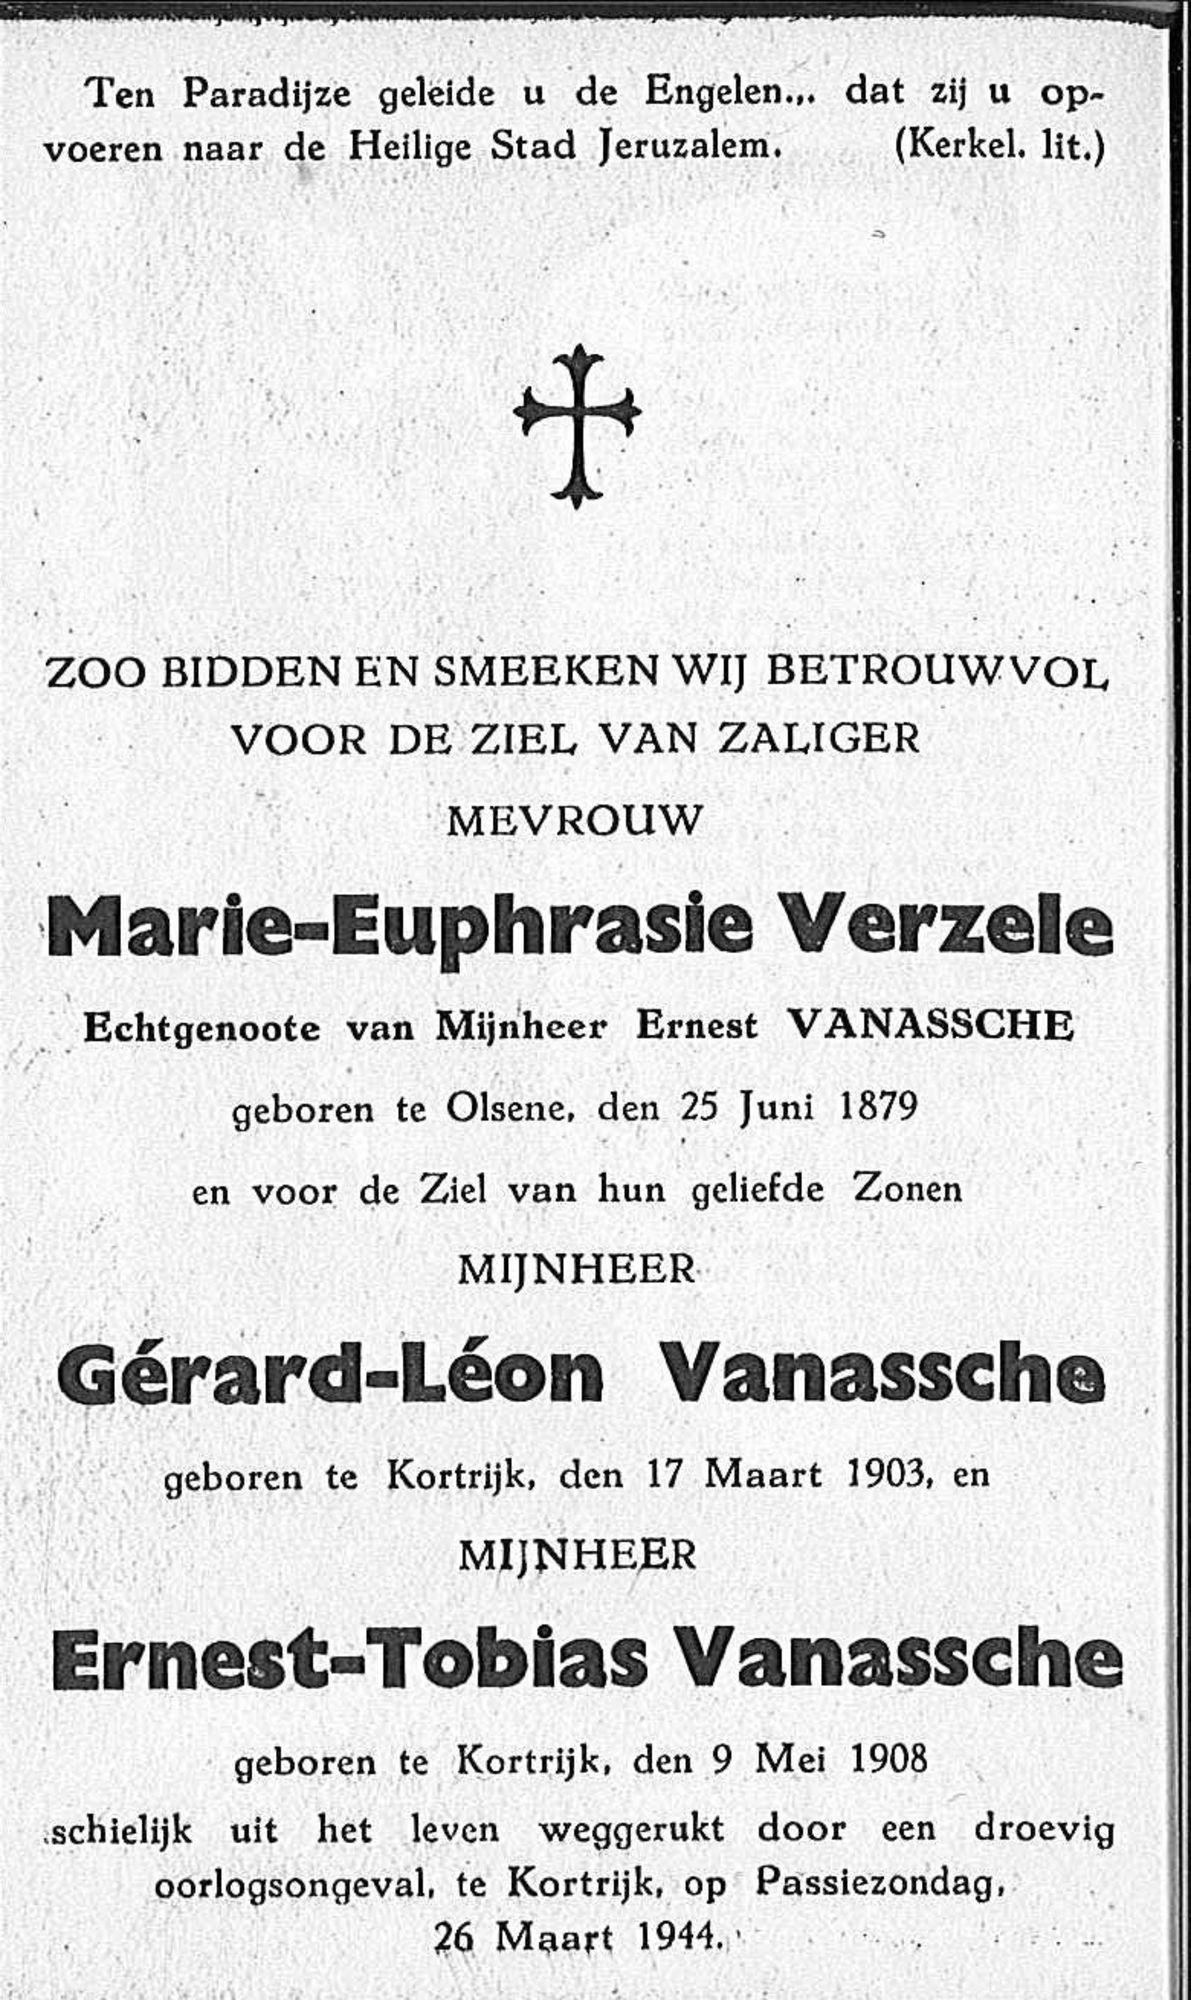 Marie-Euphrasie Verzele